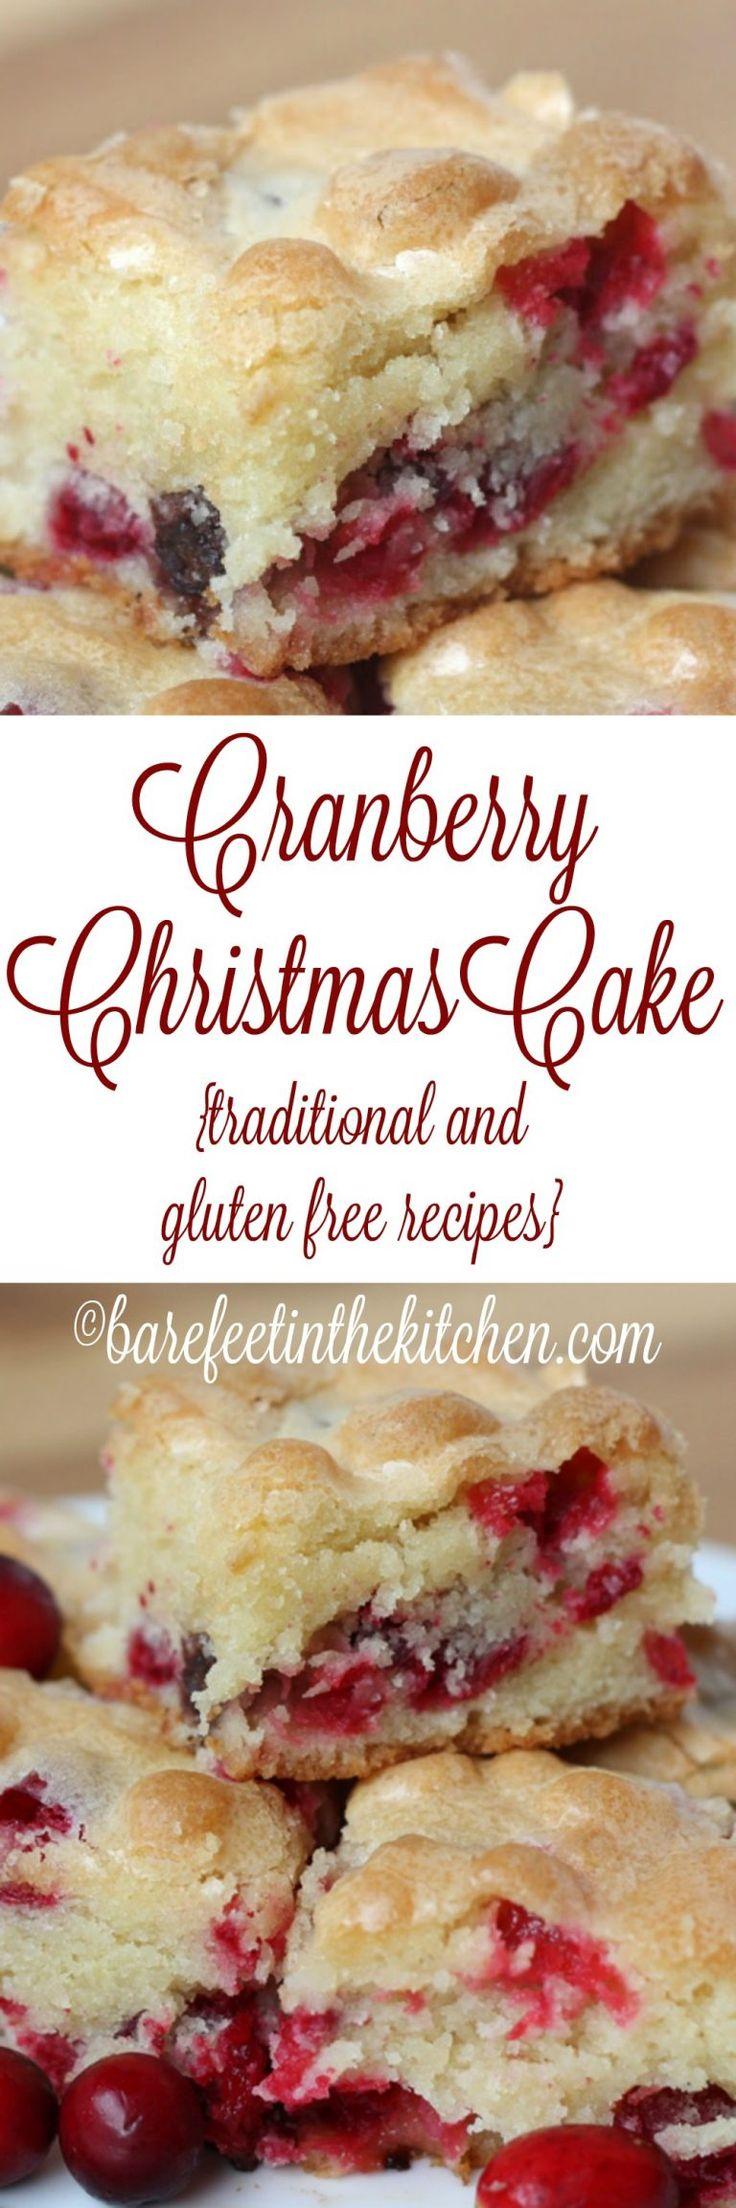 Cranberry Christmas Cake. Get the recipe at barefeetinthekitchen.com